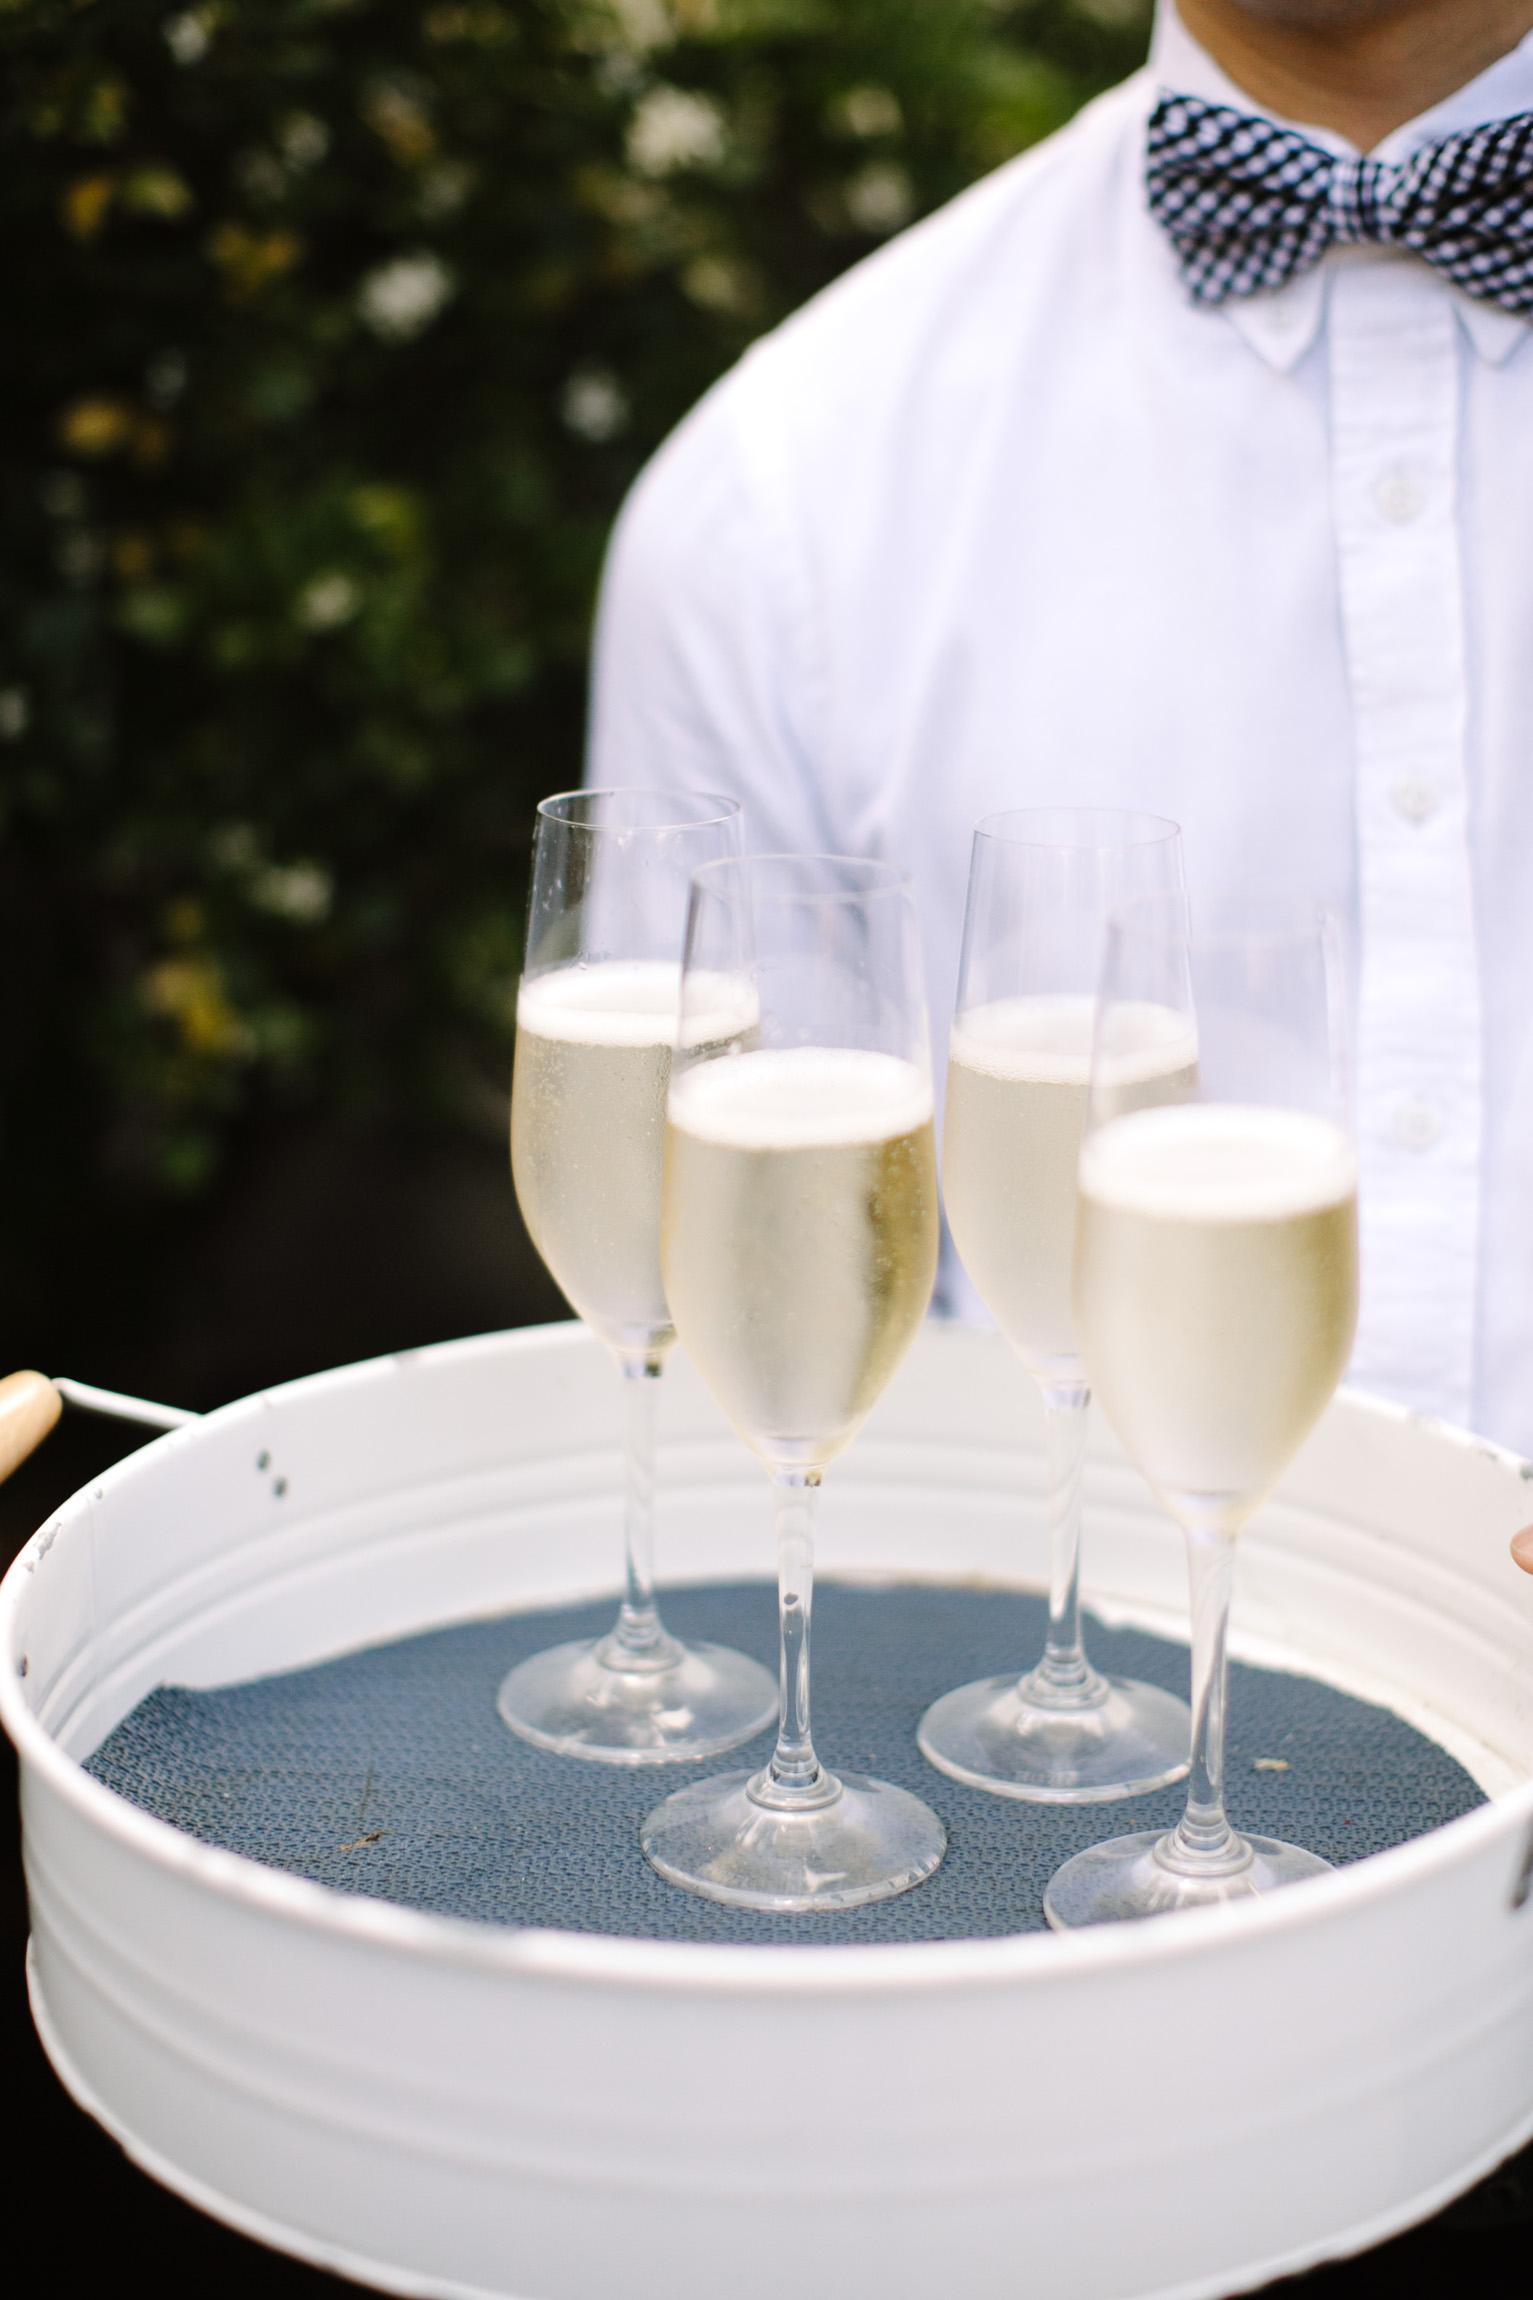 180223_justinaaron_wedding_charlotte_david_h-67.jpg